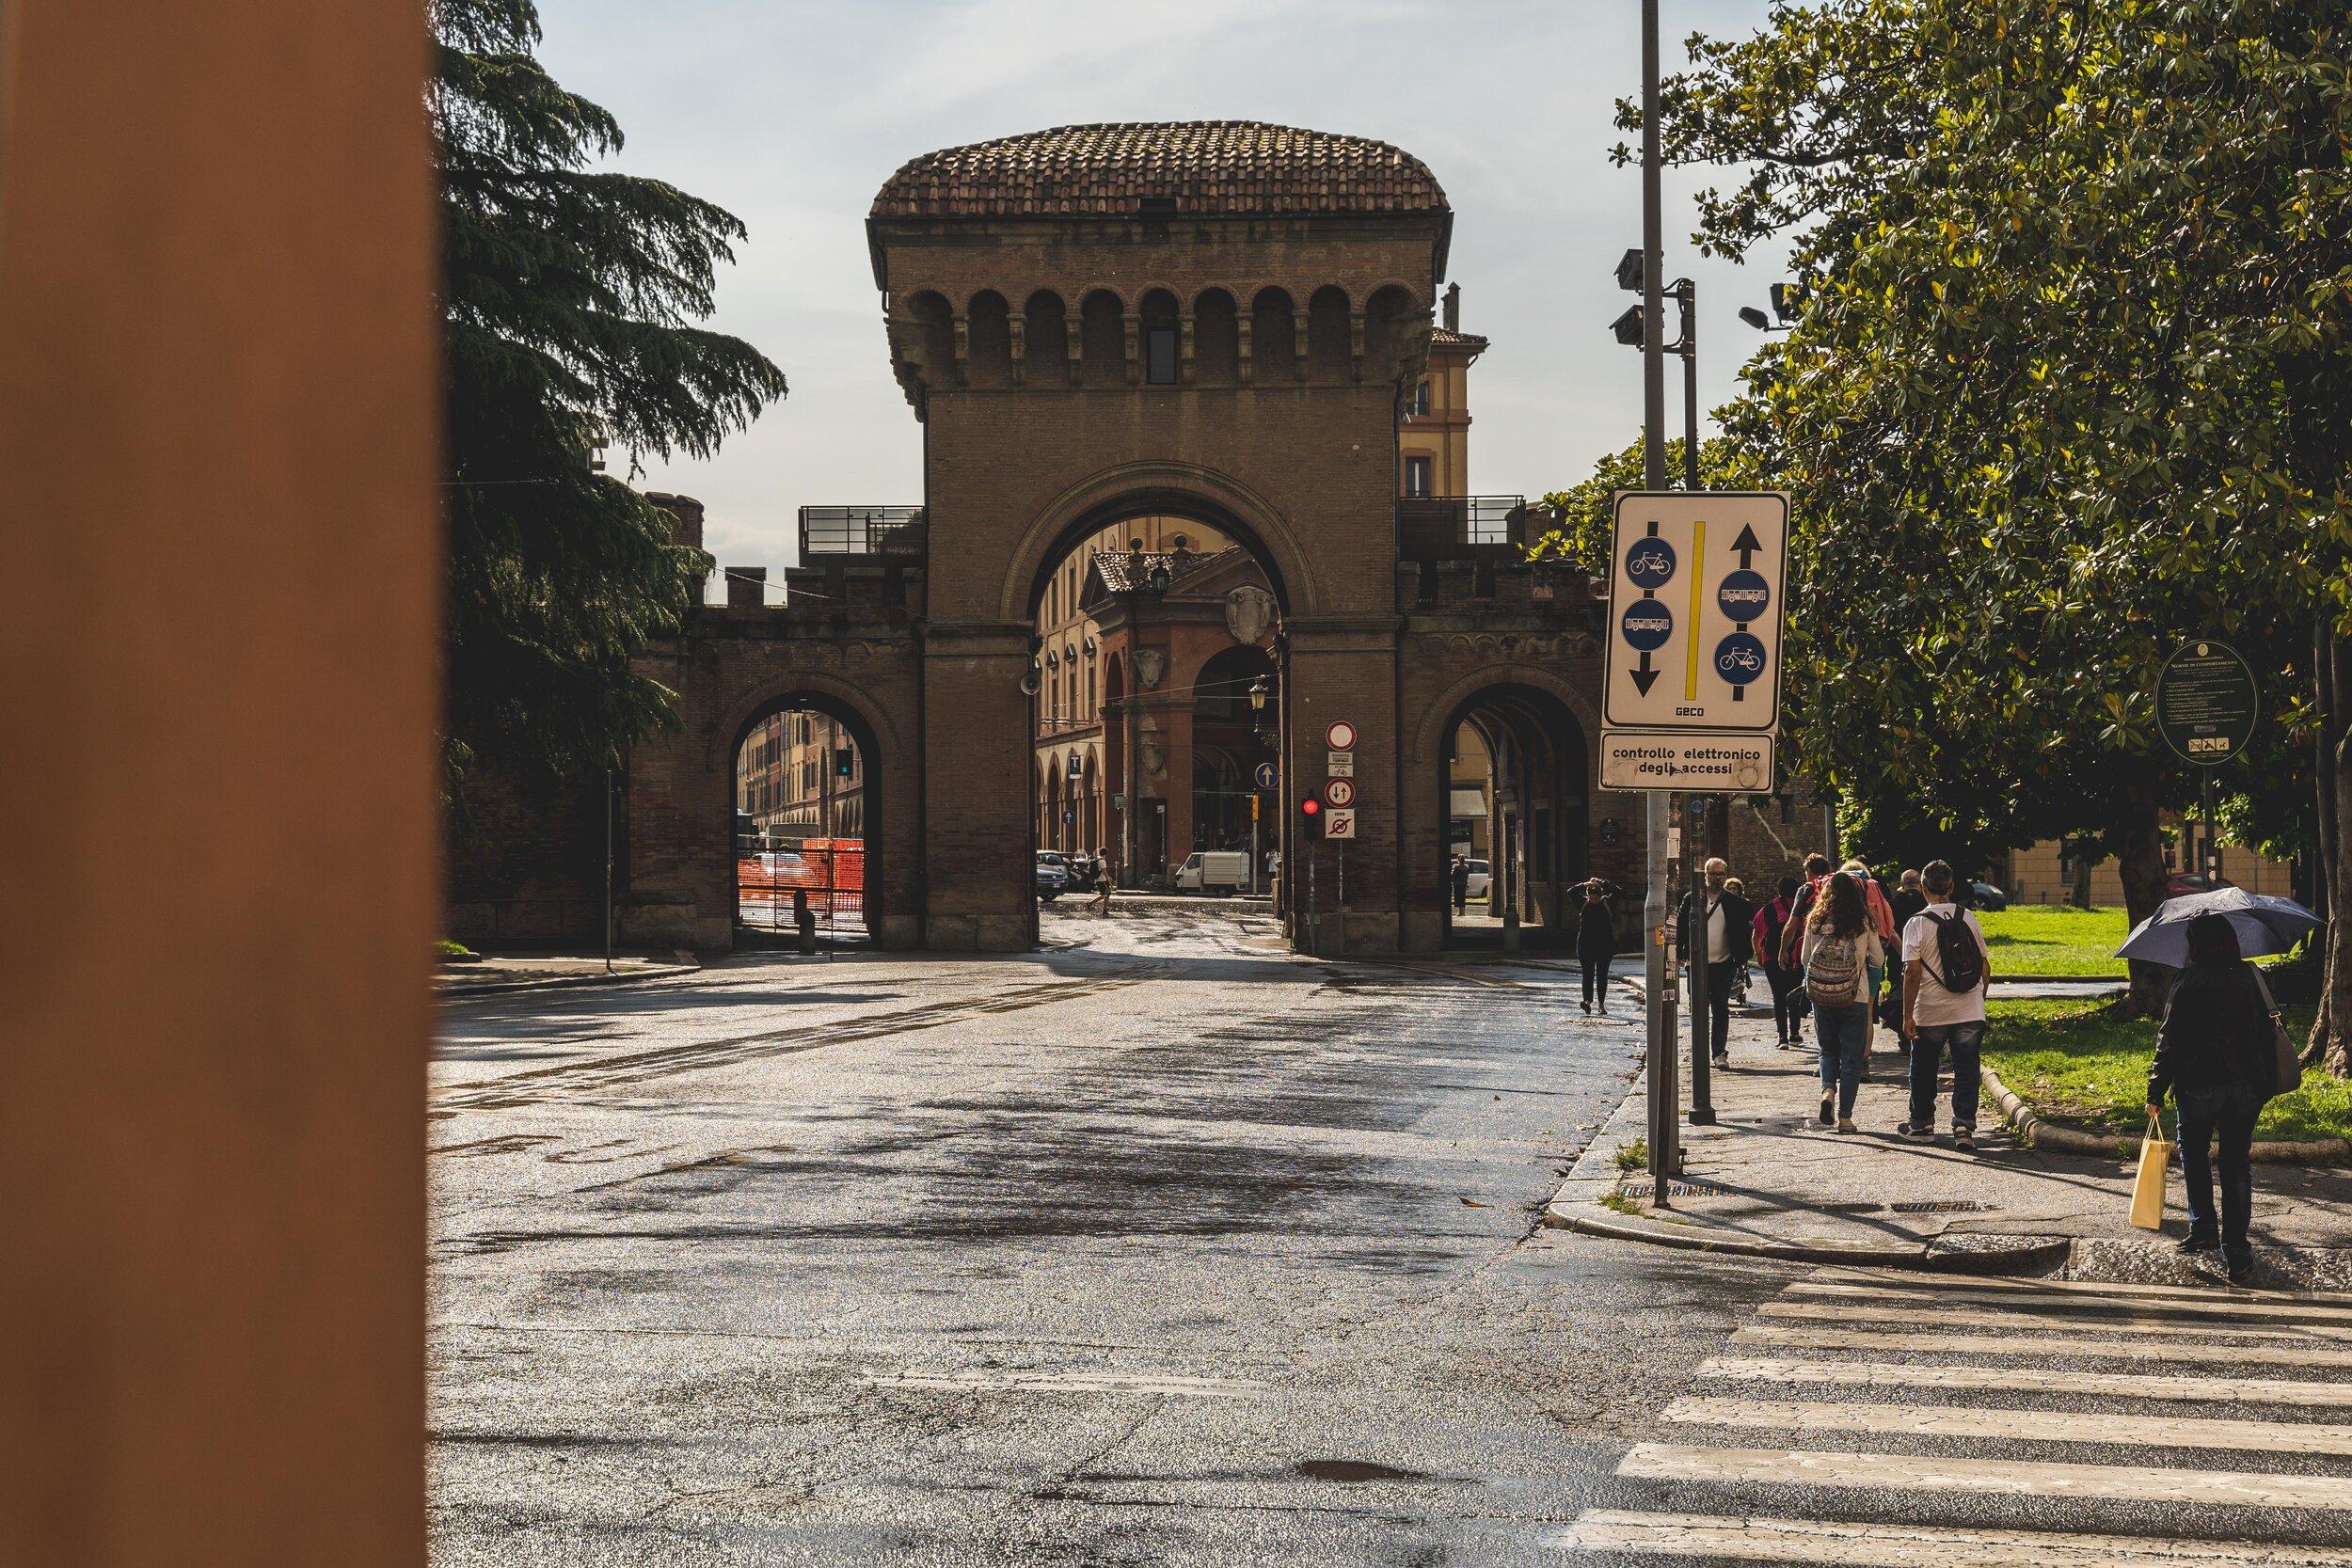 Porta Saragozza bologna city gate road.jpg